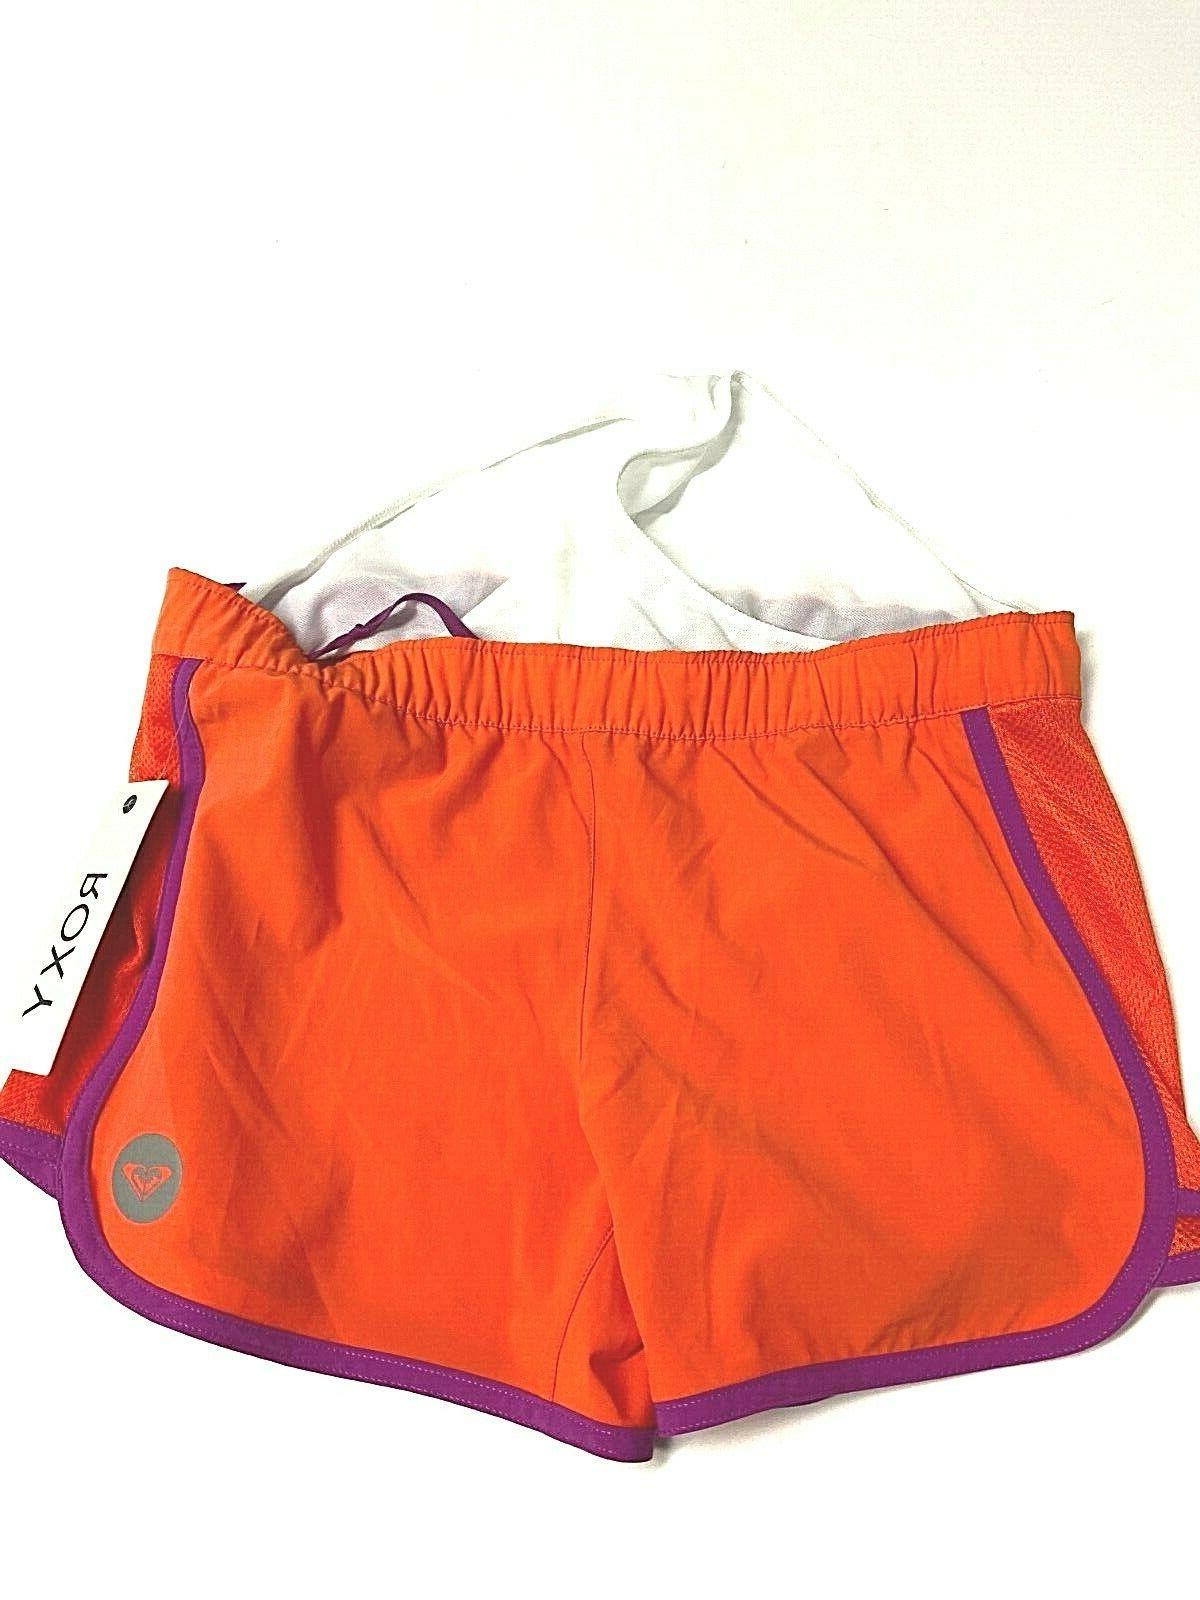 Roxy Line Shorts Size S Orange Liner Workout